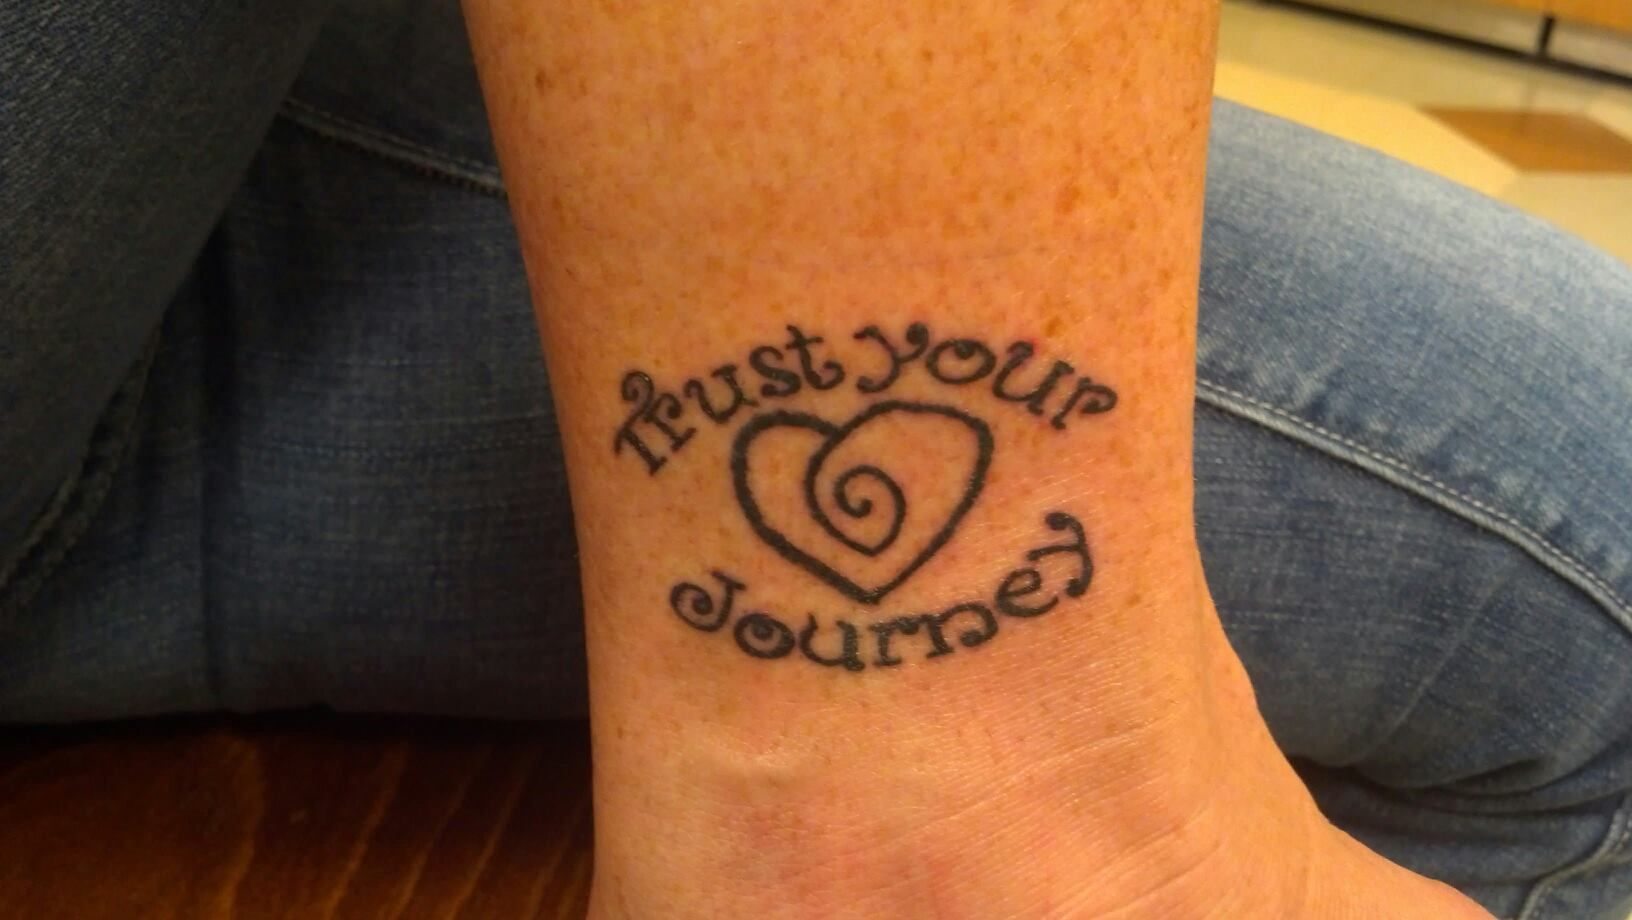 Love this trust your journey tattoo tyj tattoos for the journey love this trust your journey tattoo buycottarizona